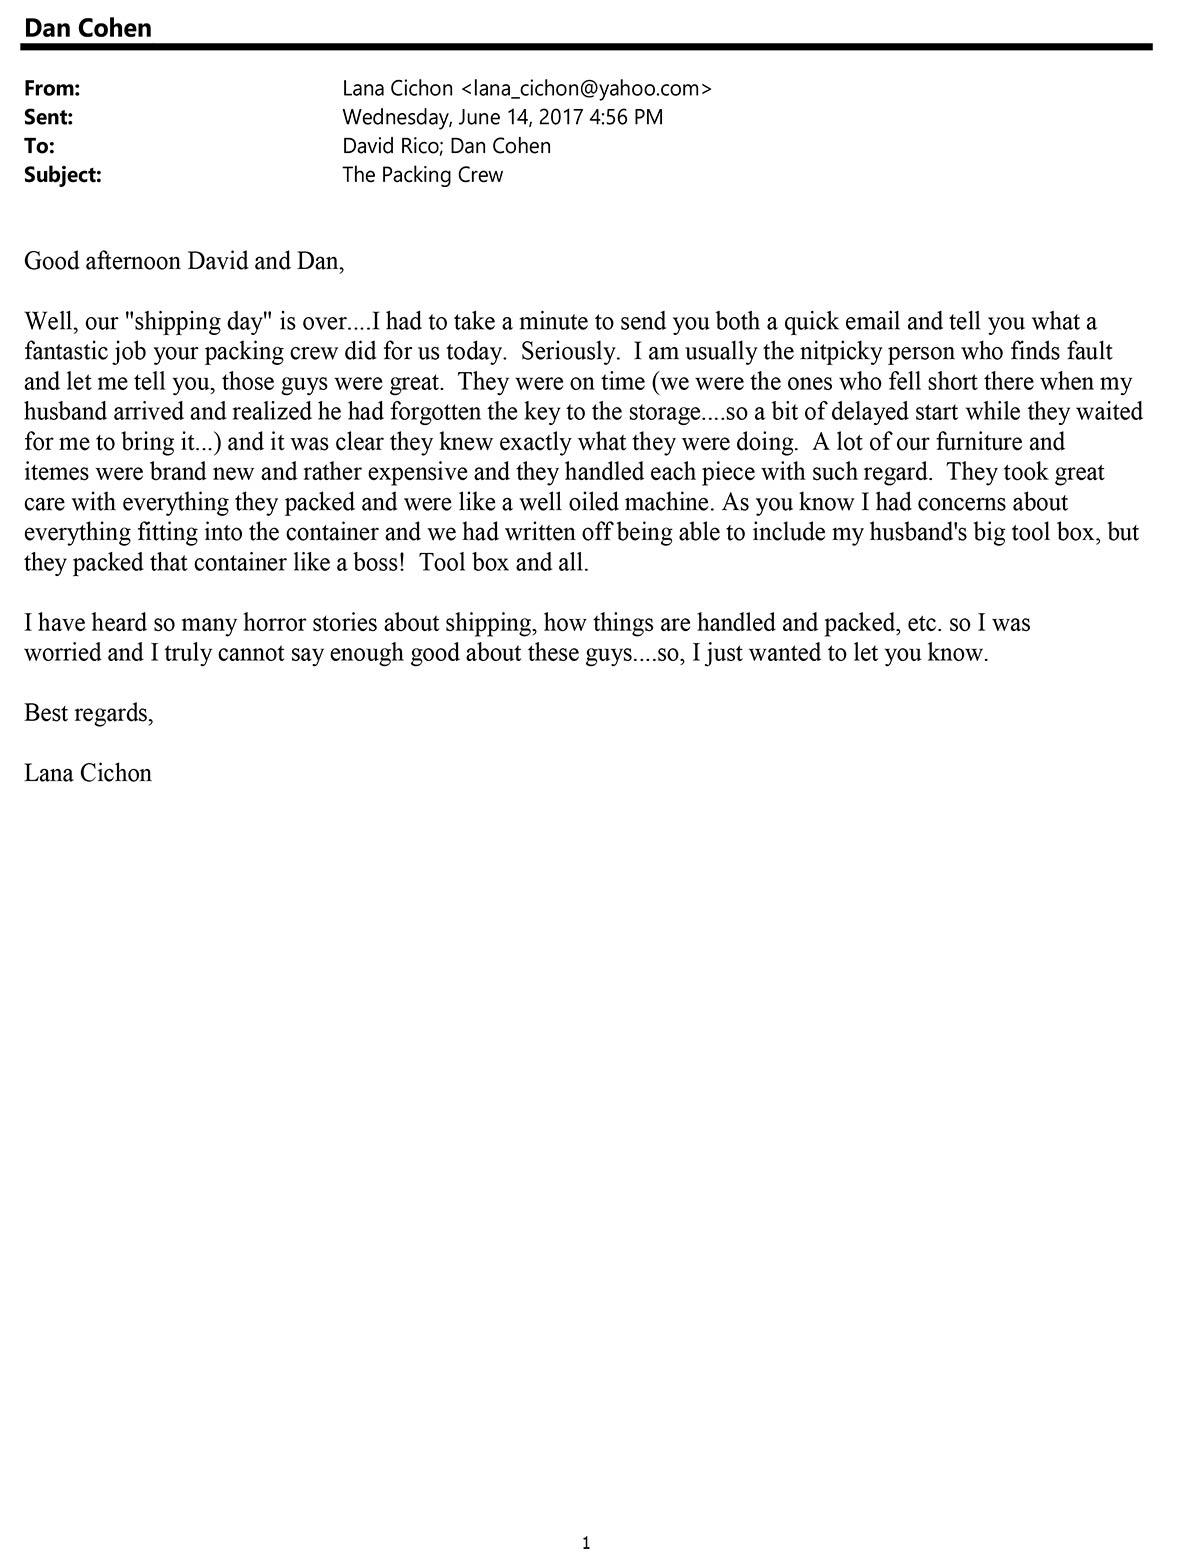 Testimonial 97 Lana Cichon